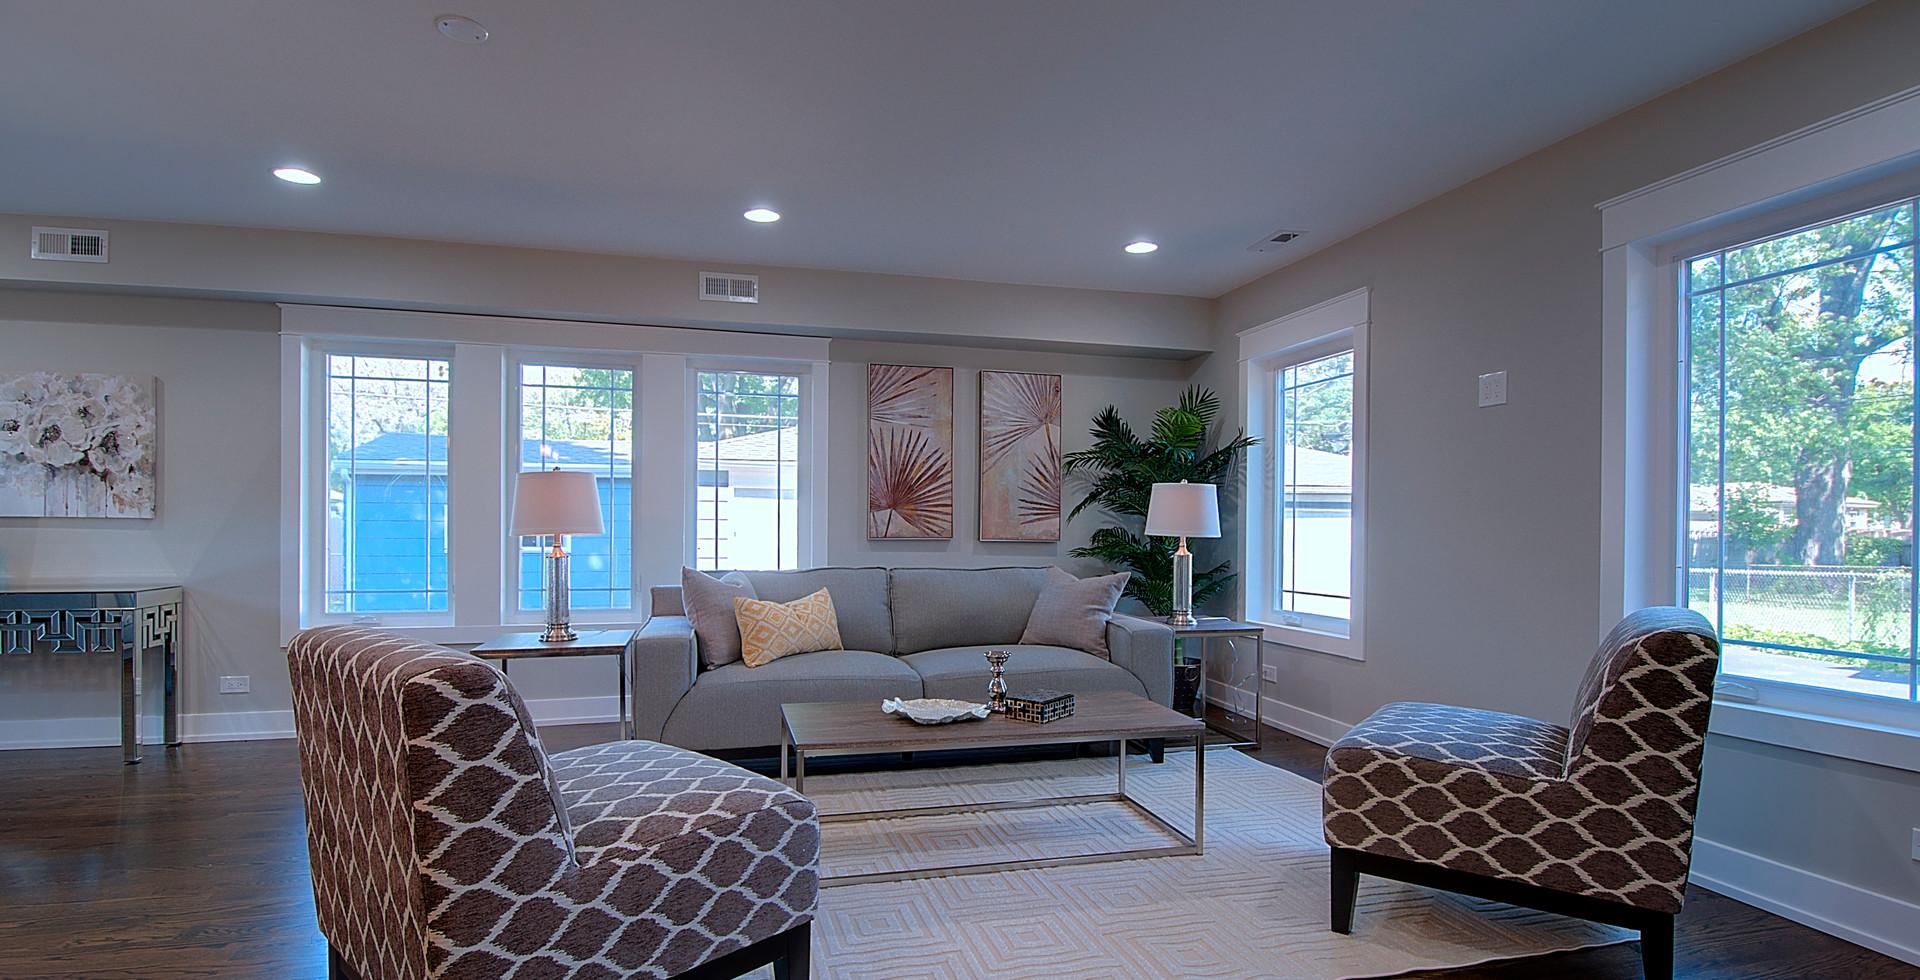 Living Room in Villa Park designed by MRM Home Design.jpg